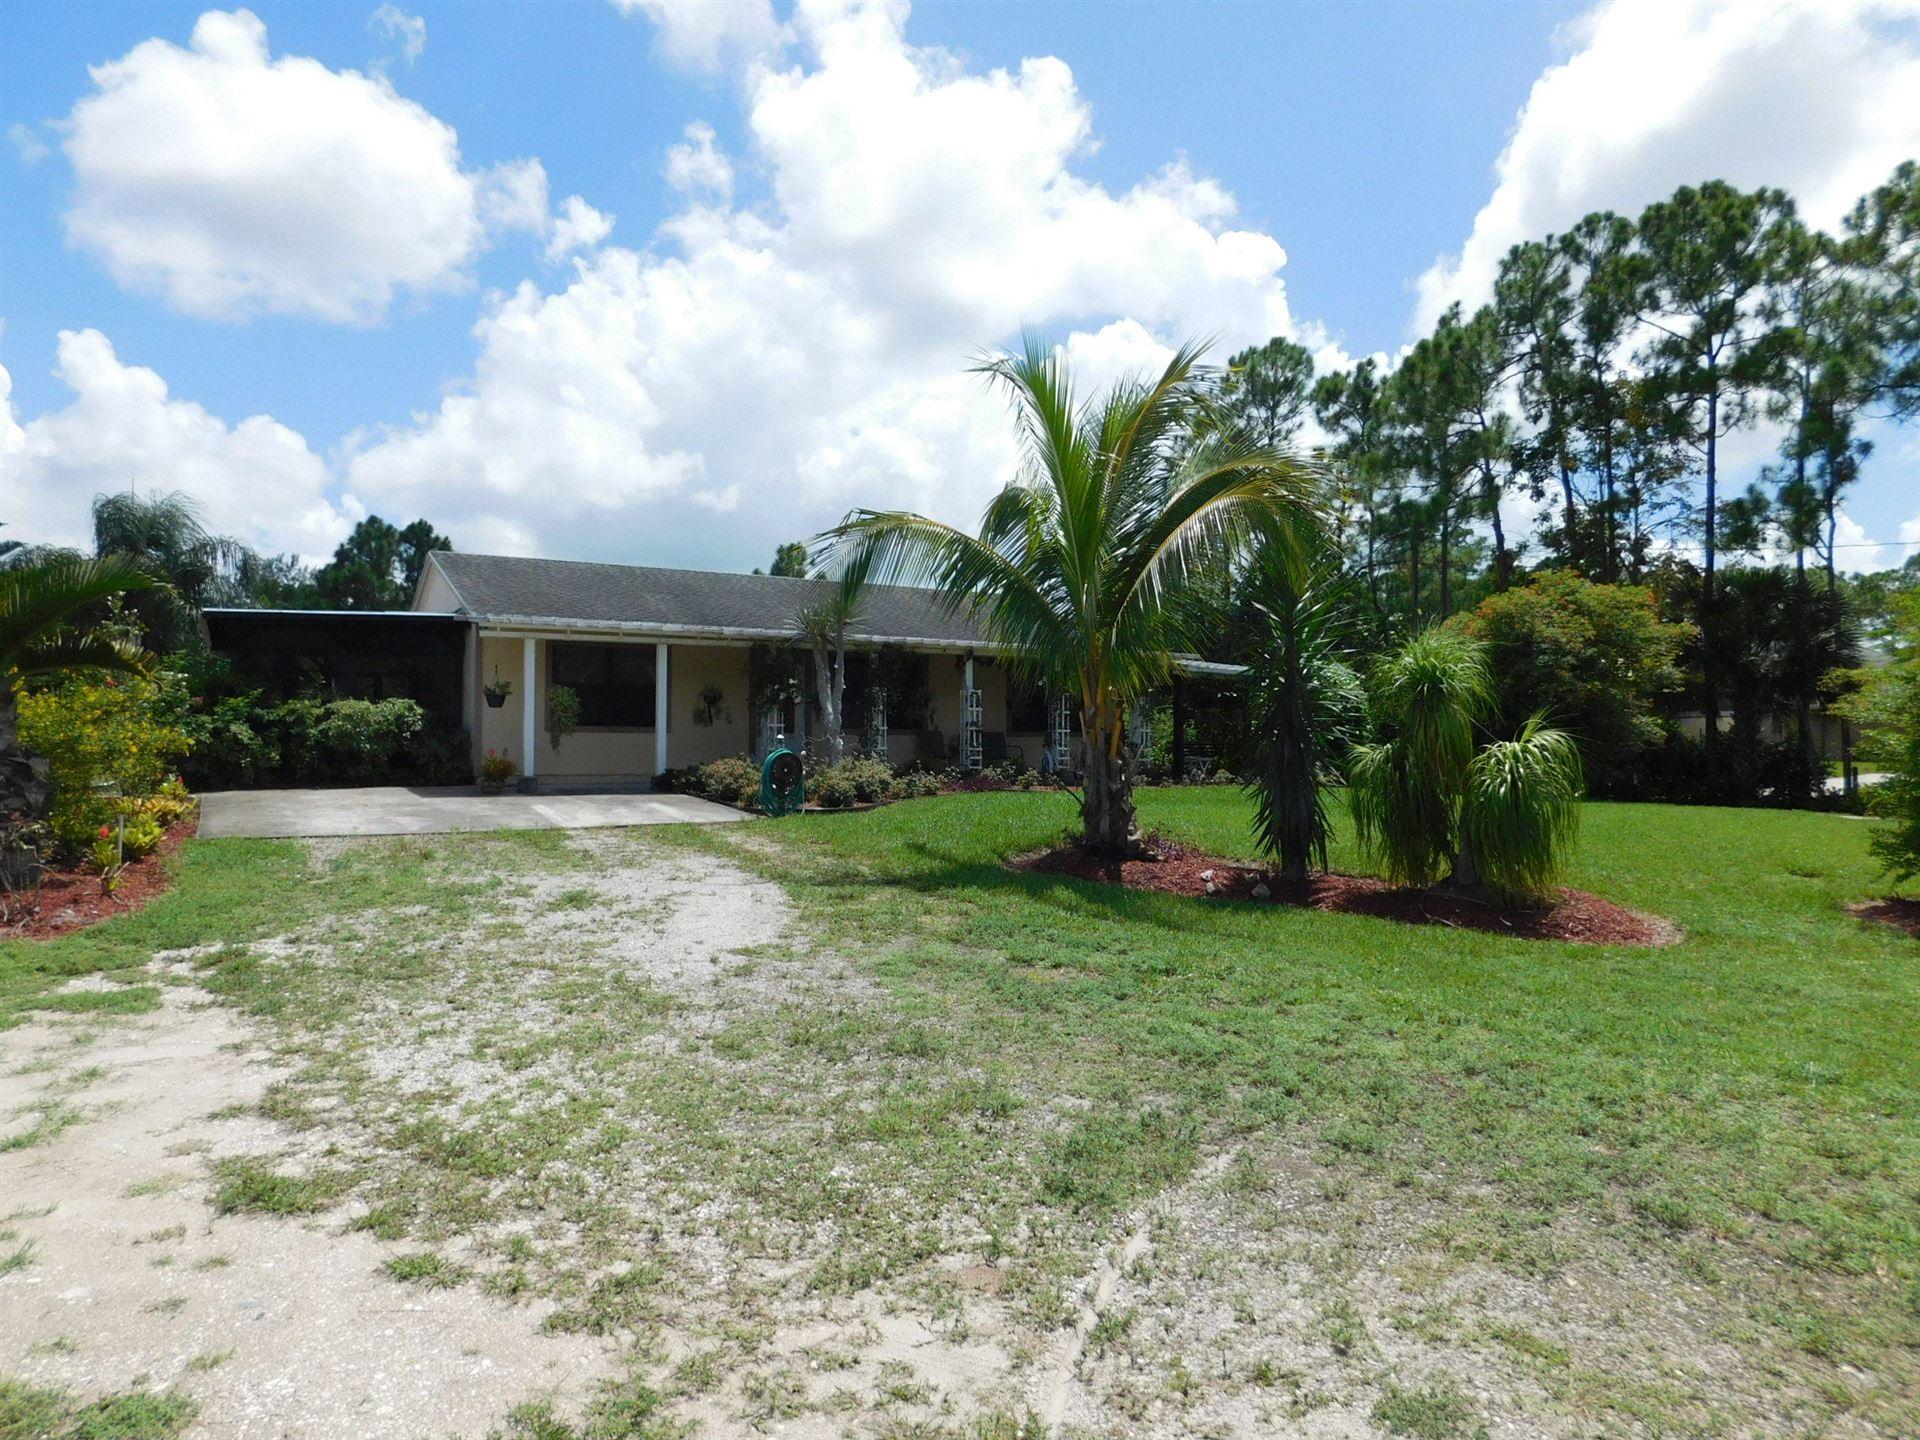 13170 61st Lane N, West Palm Beach, FL 33412 - #: RX-10641933